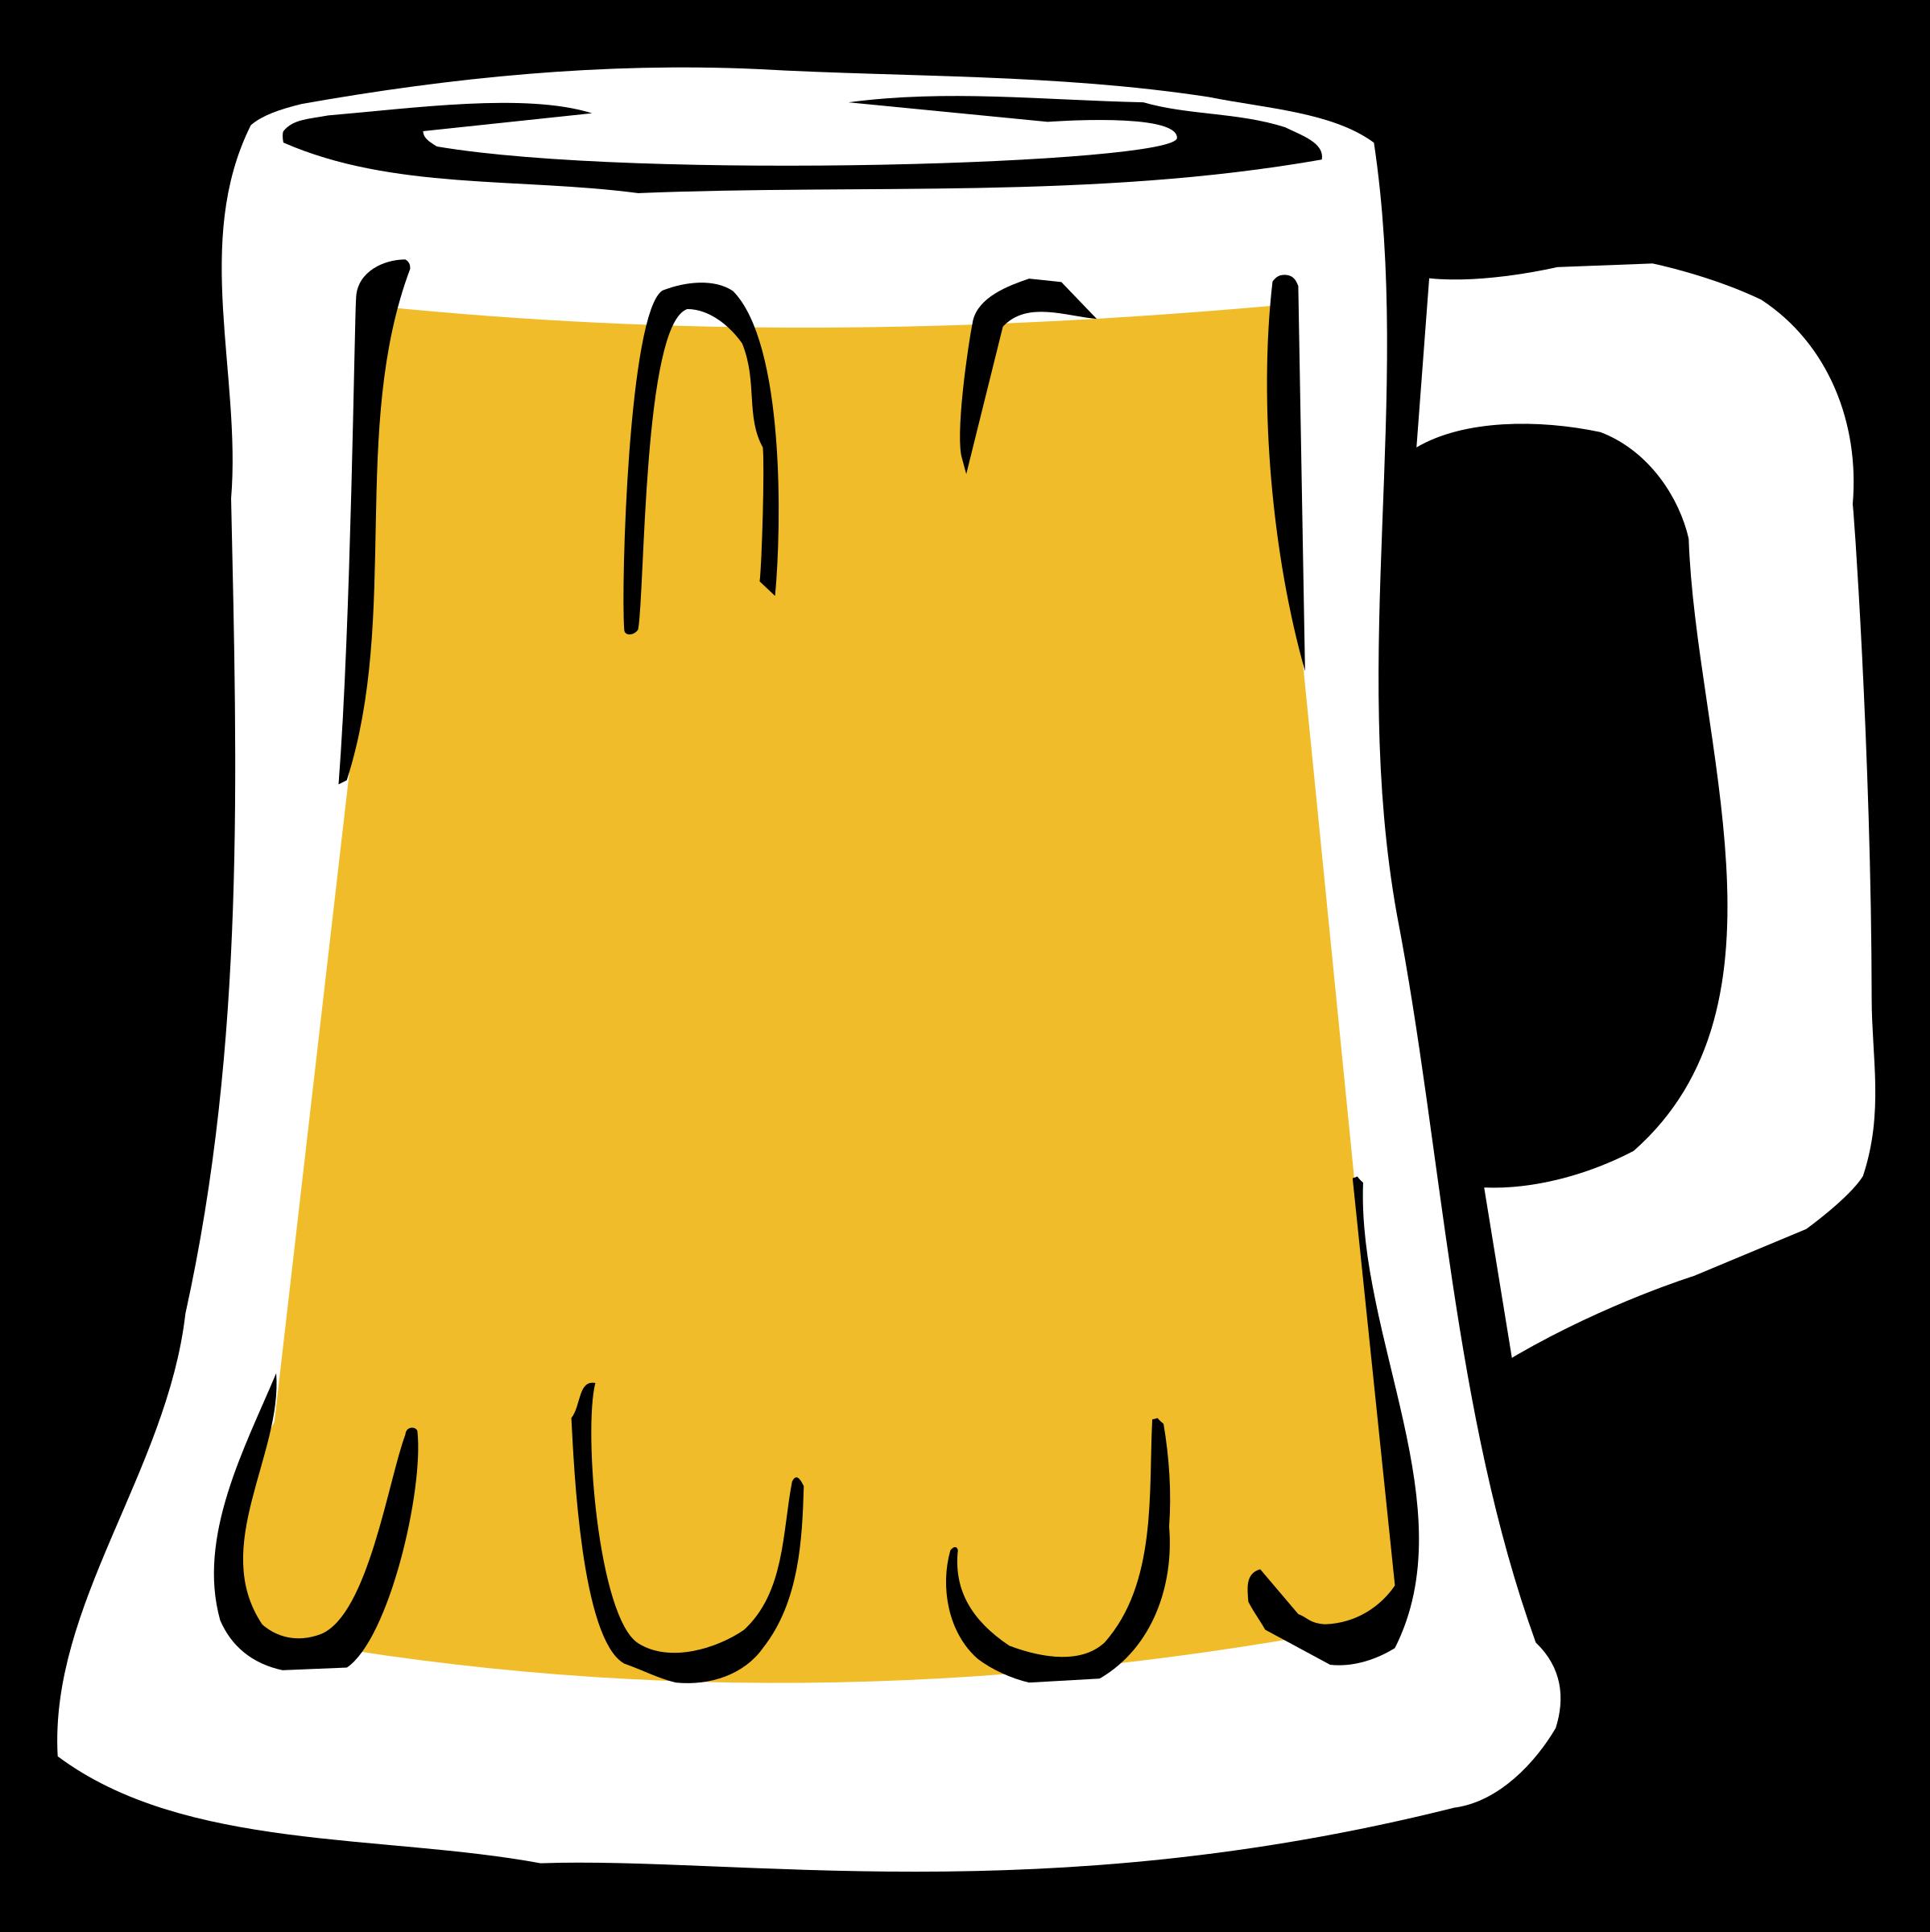 Mug clipart glass mug. Fatty matty brewing beer